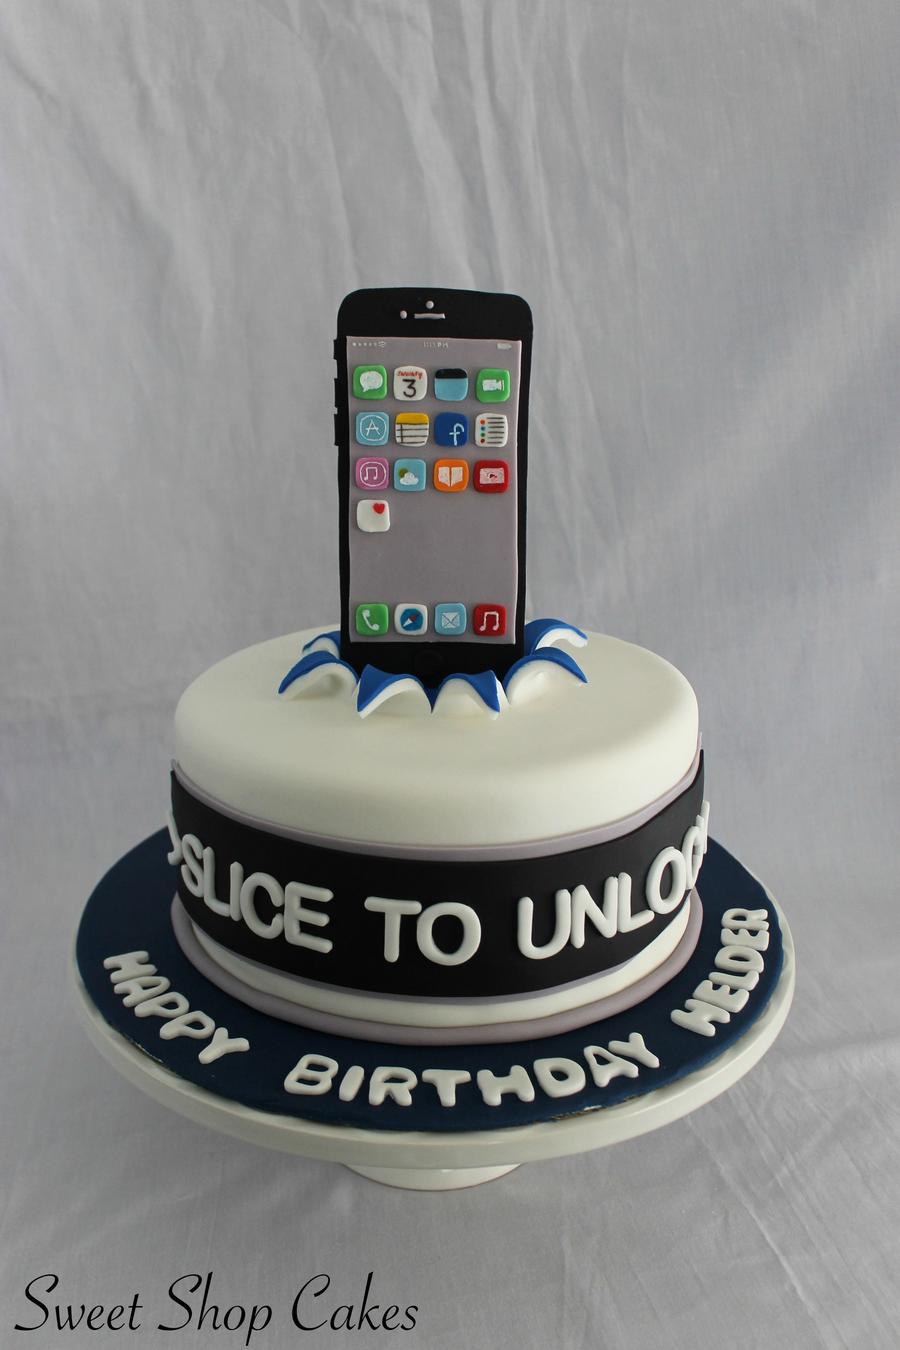 Iphone Cake Decorating Ideas